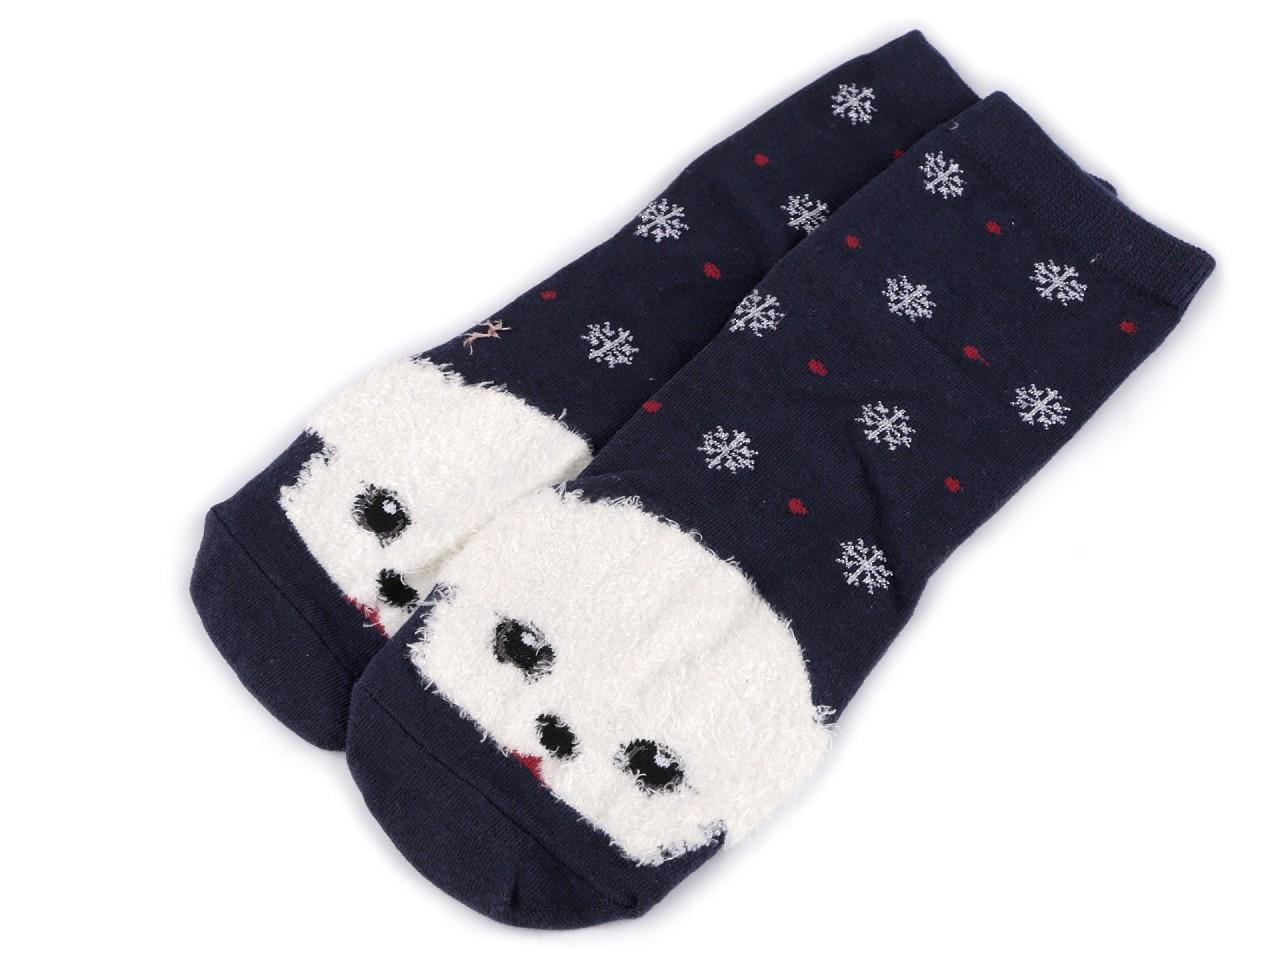 Dětské ponožky pes, barva 4 modrá tmavá